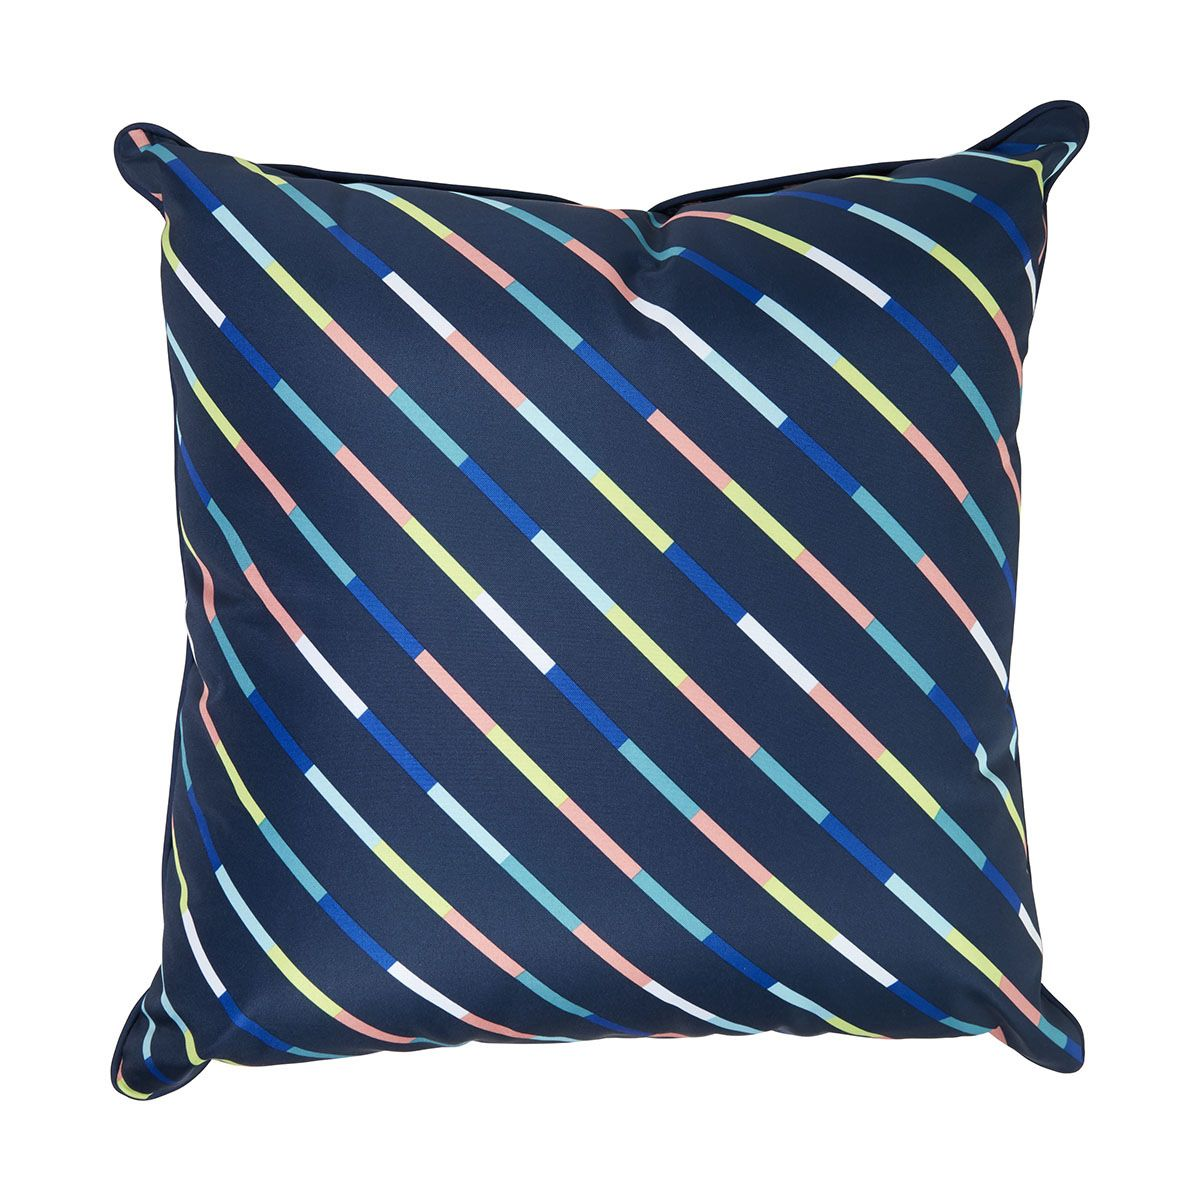 50cm Stripe Outdoor Cushion Kmart Outdoor cushions